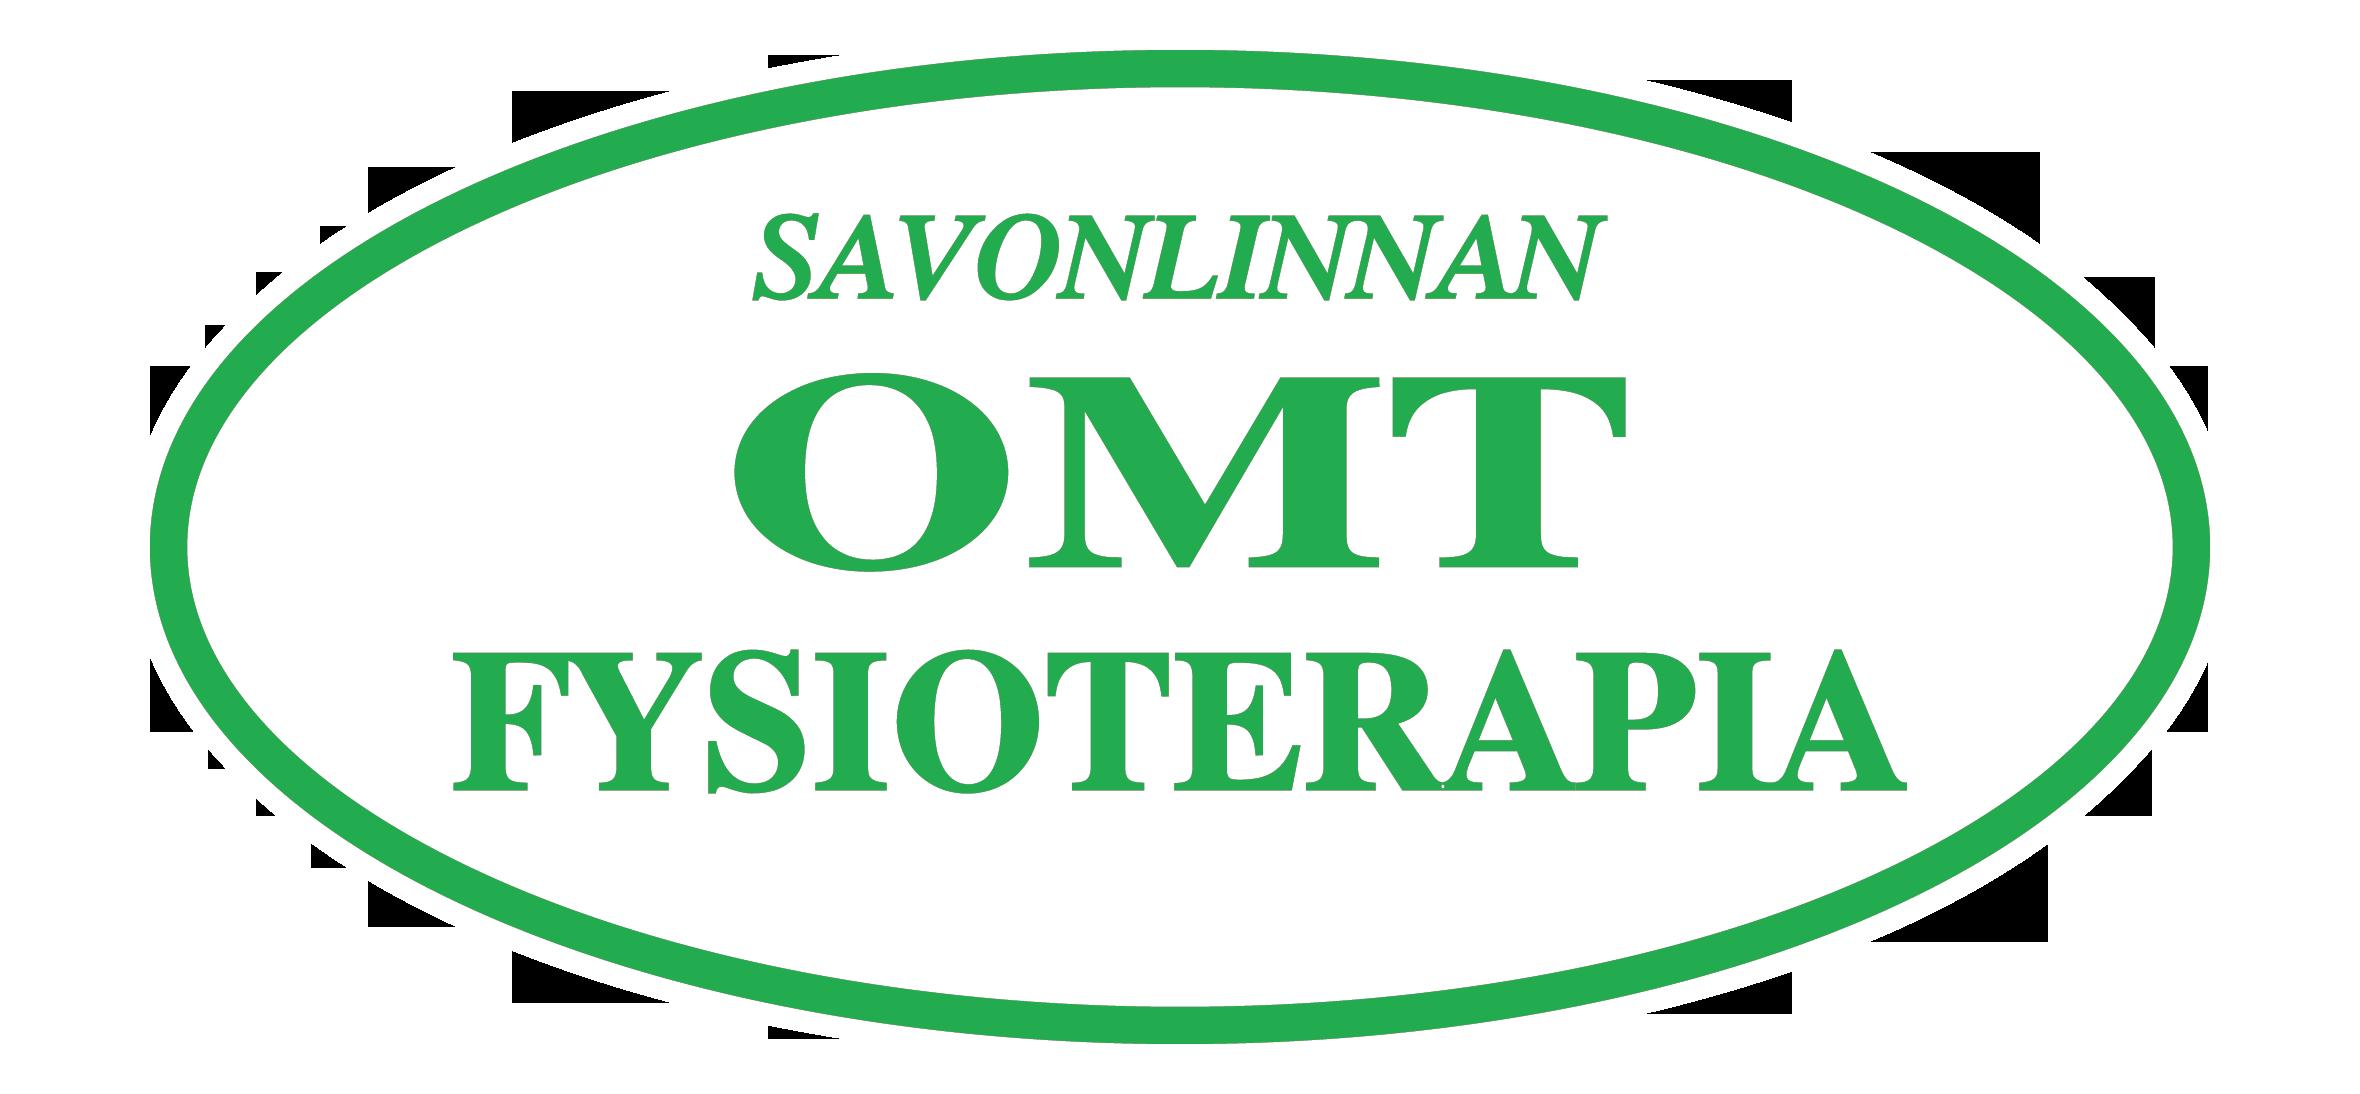 Omt Fysioterapia Savonlinna